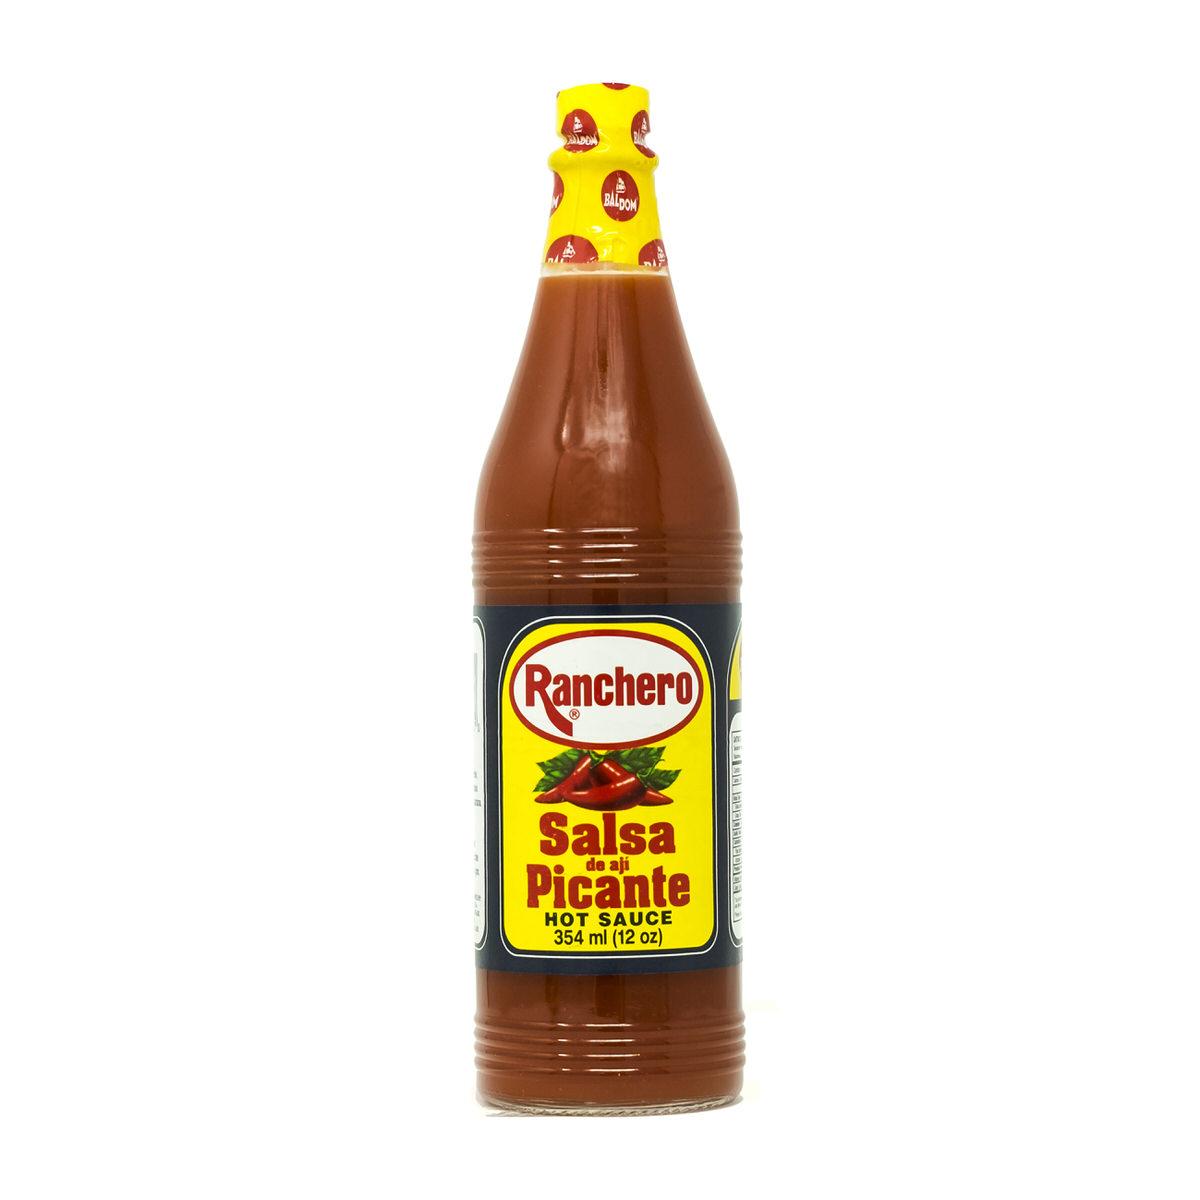 Salsa de ají picante Ranchero